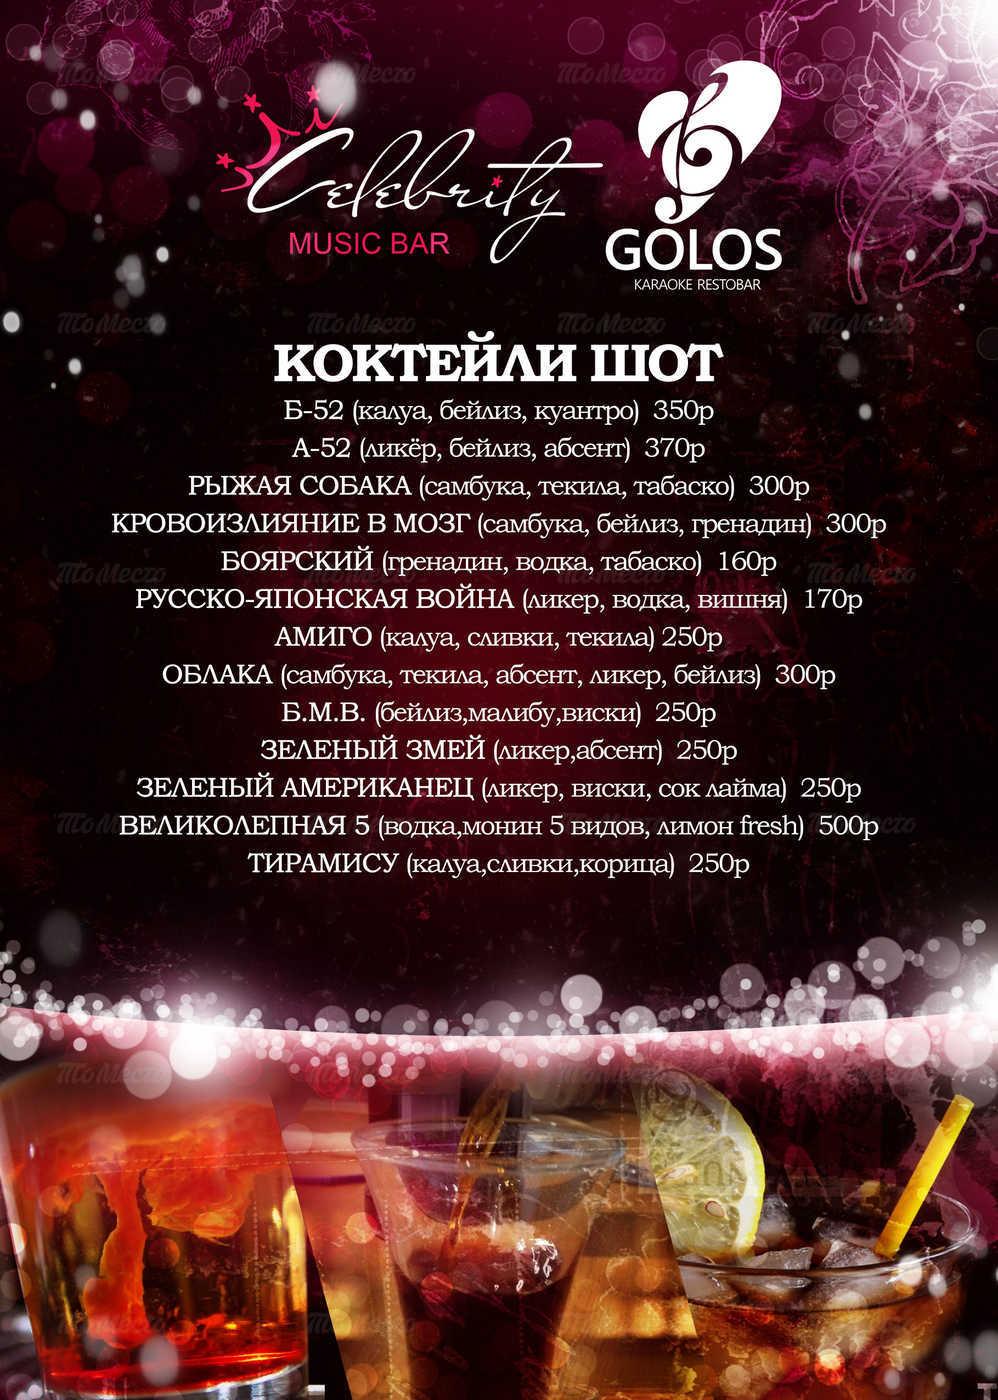 Меню бара, караоке клуба, ресторана Голос (Golos) на Бухарестской улице